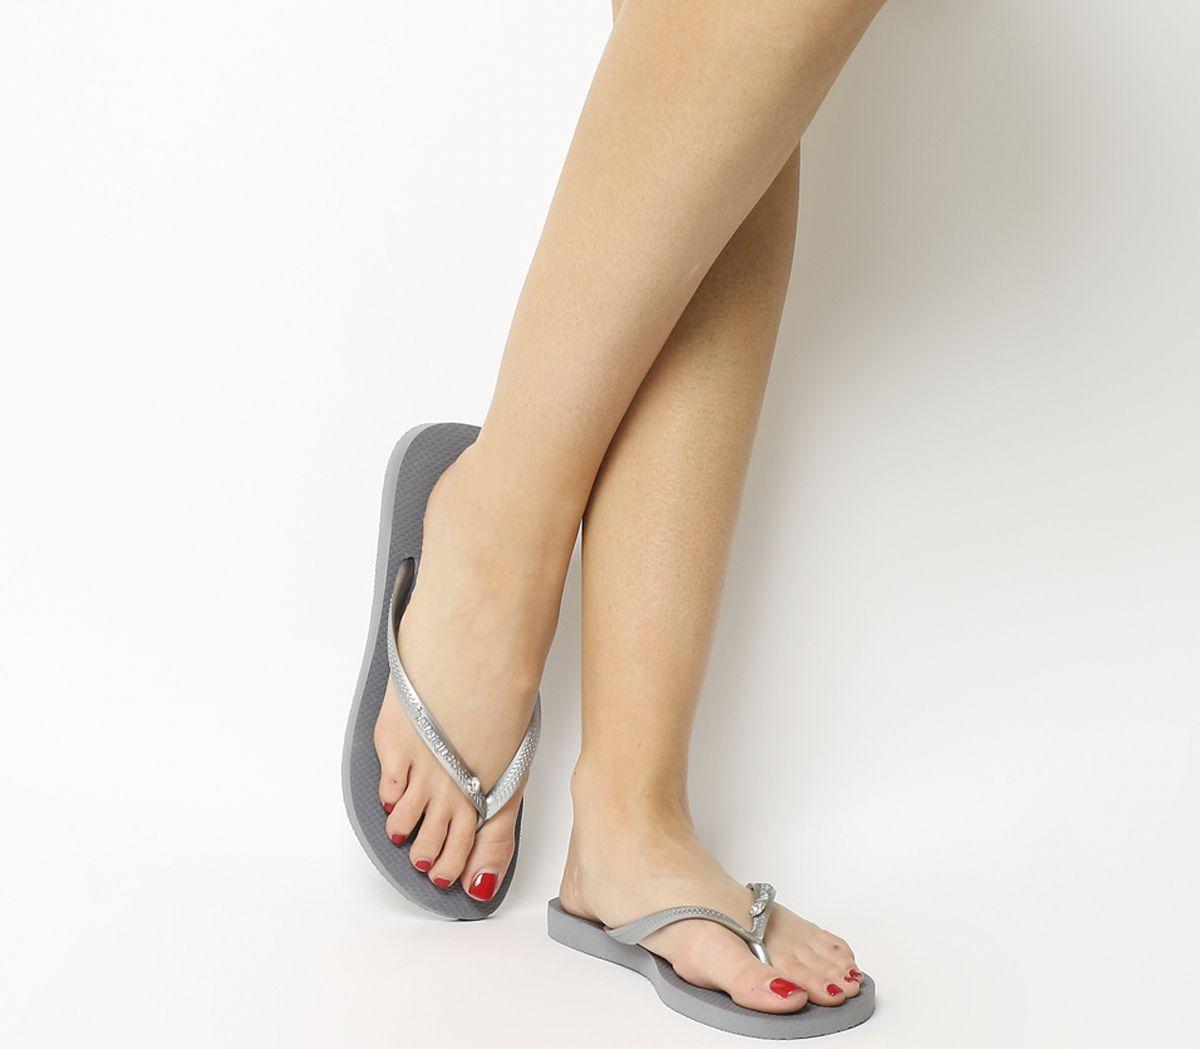 f0a7909aa Havaianas Slim Crystal Glamour Steel Grey - Sandals